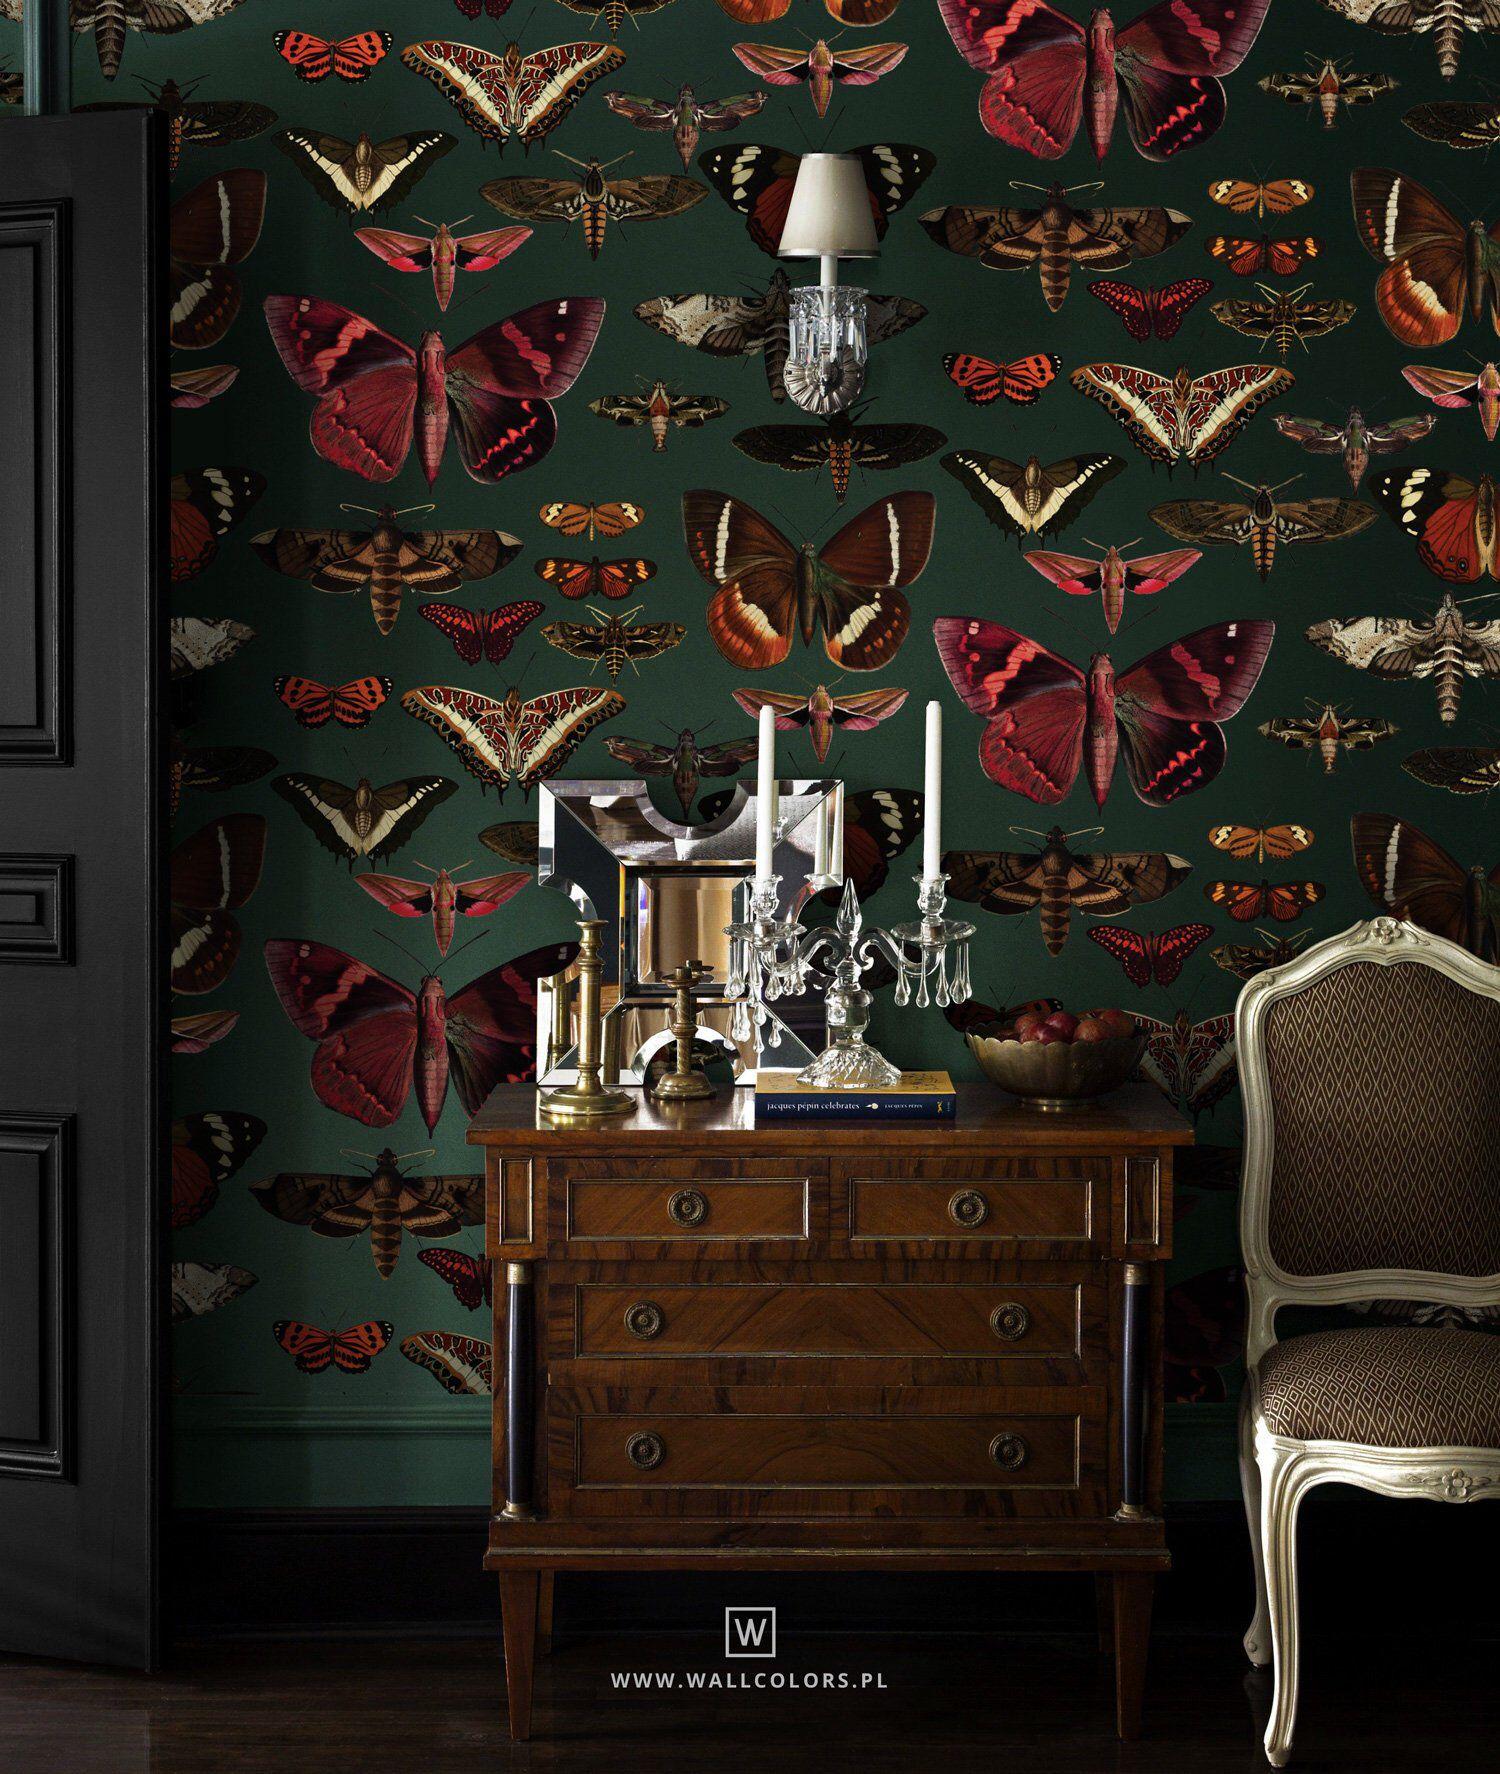 Removable Vintage Wallpaper Butterflies Pattern Dark Green Etsy Vintage Wallpaper Living Room Decor Decor